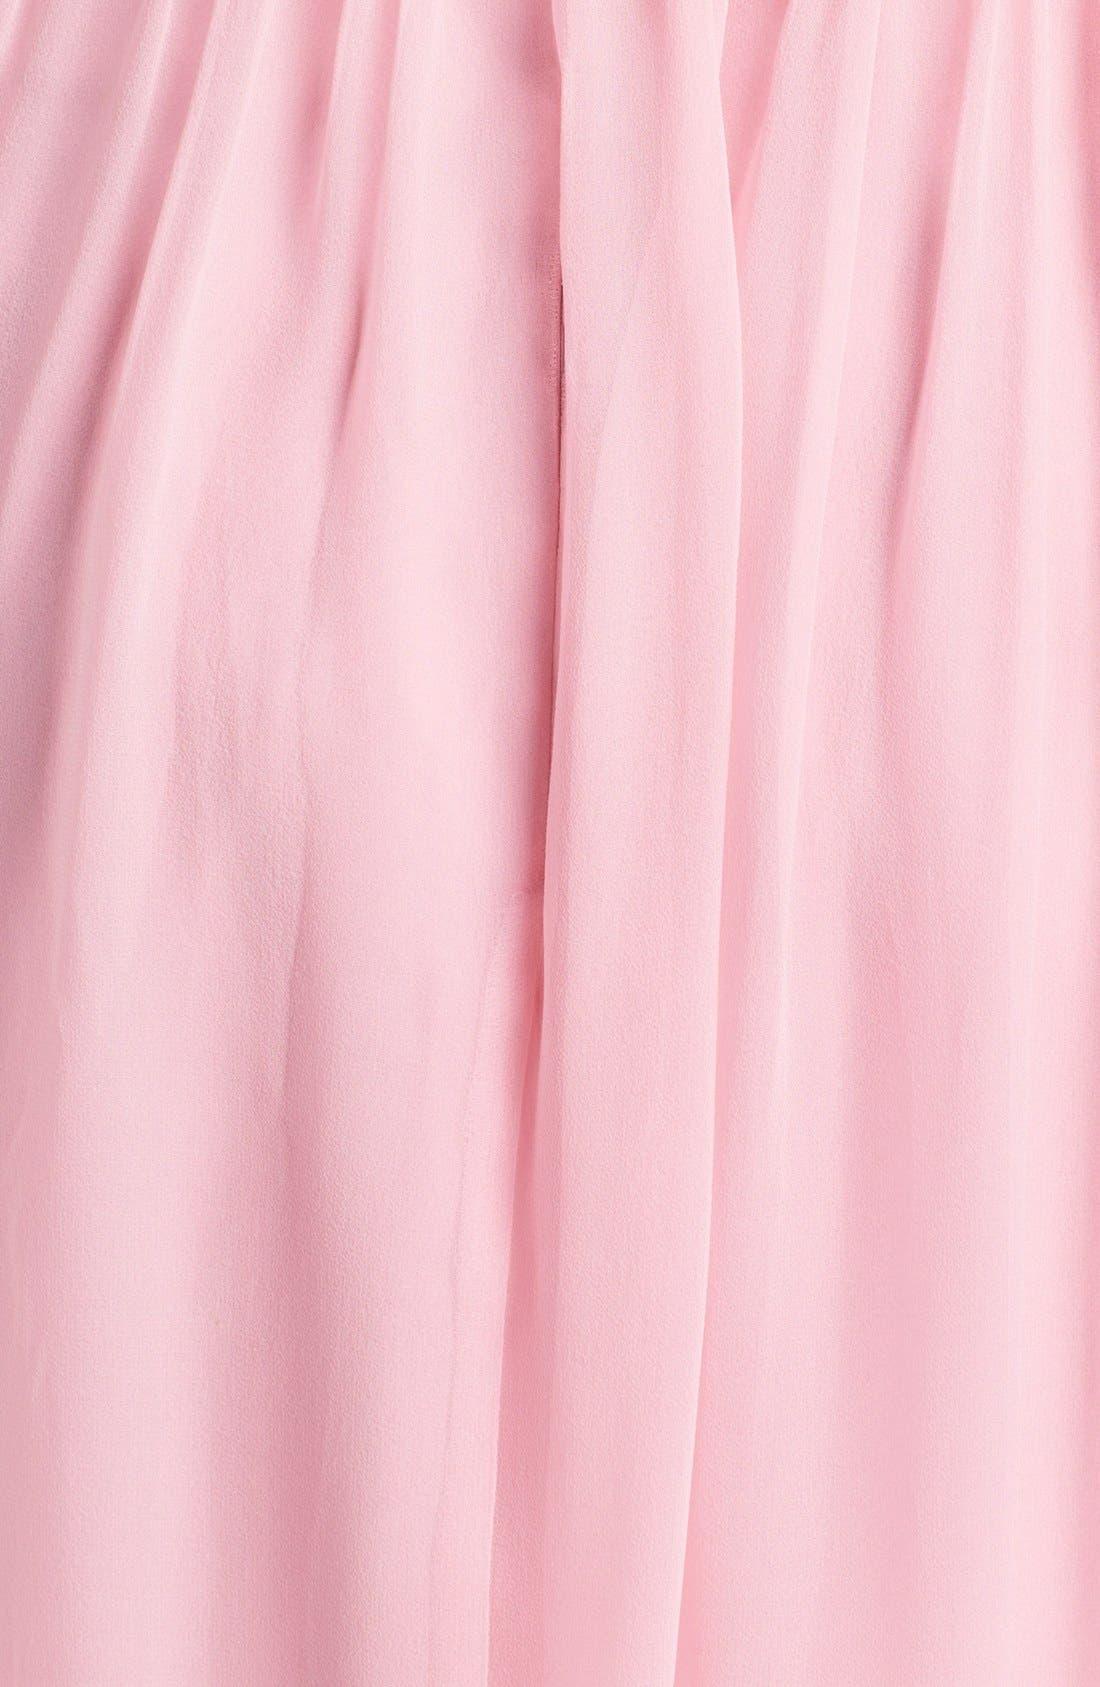 'Morgan' Strapless Silk Chiffon Dress,                             Alternate thumbnail 145, color,